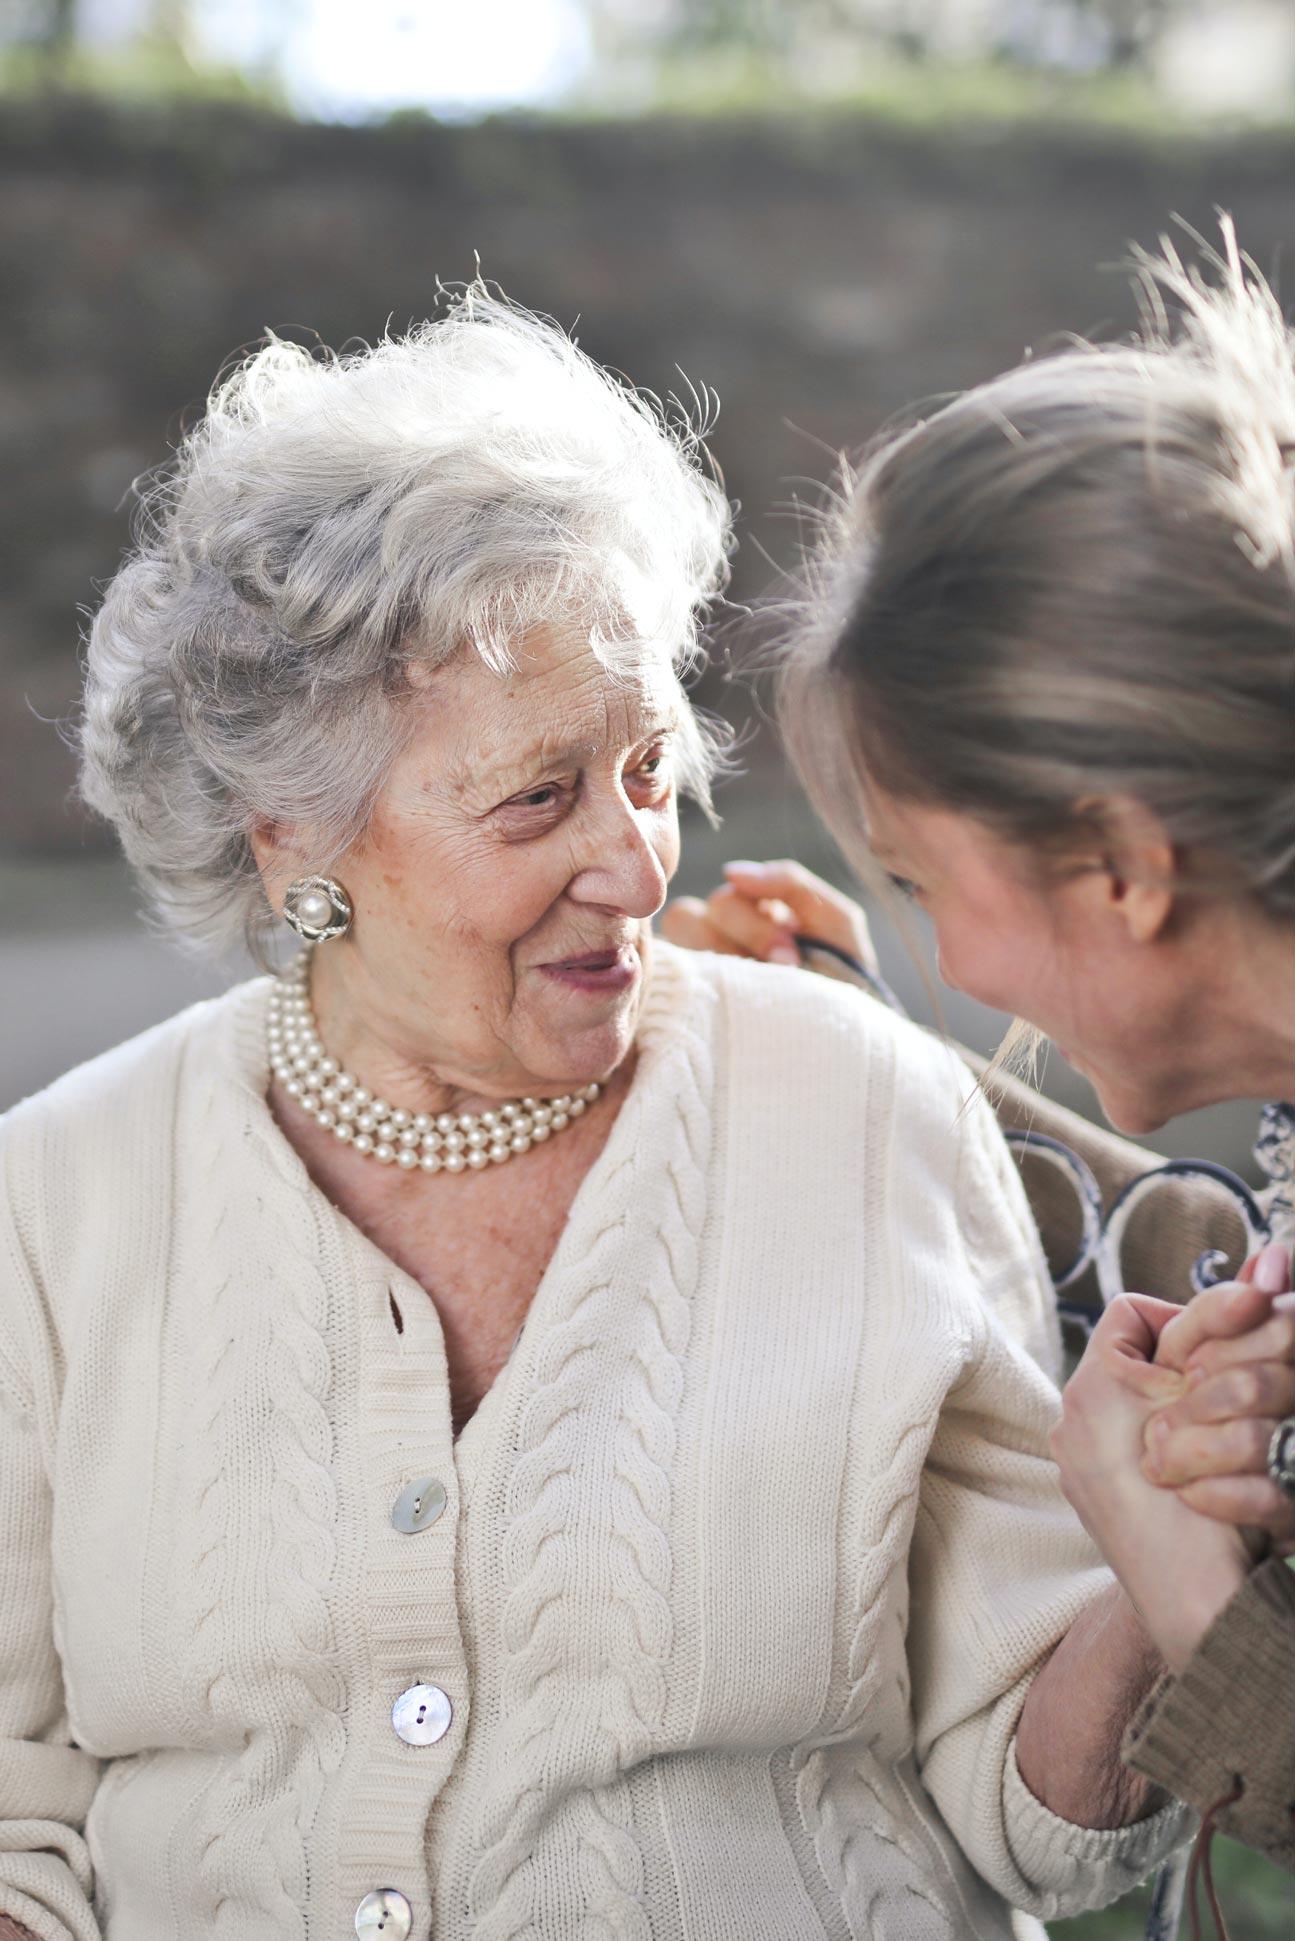 Elderly lady smiling at her female carer